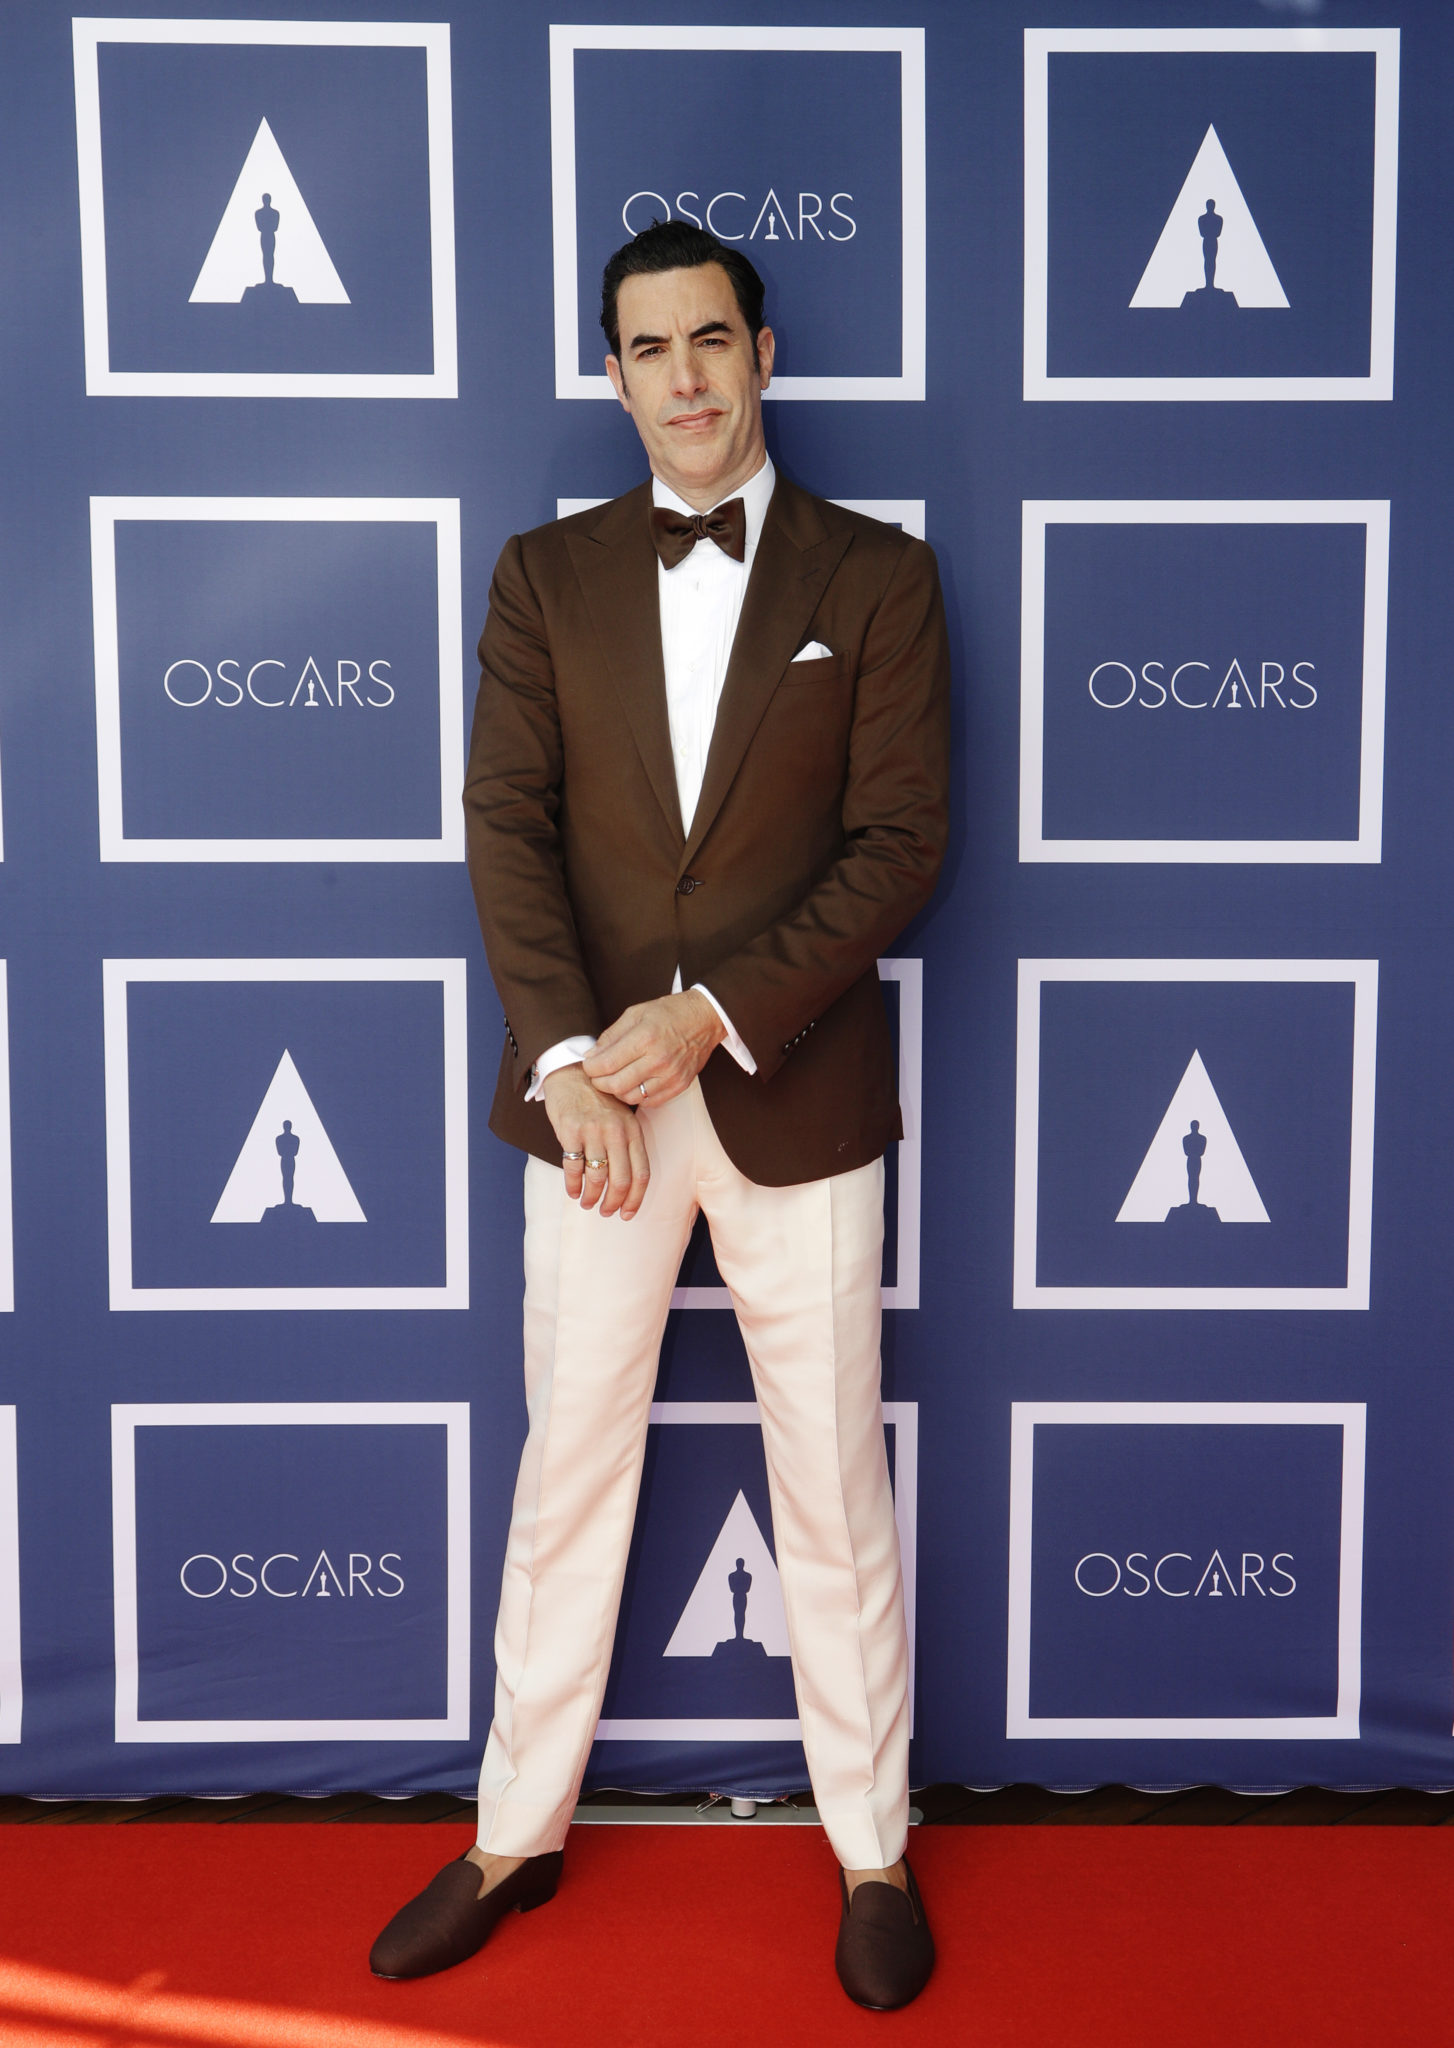 Sacha Baron Cohen at the 93rd Oscars